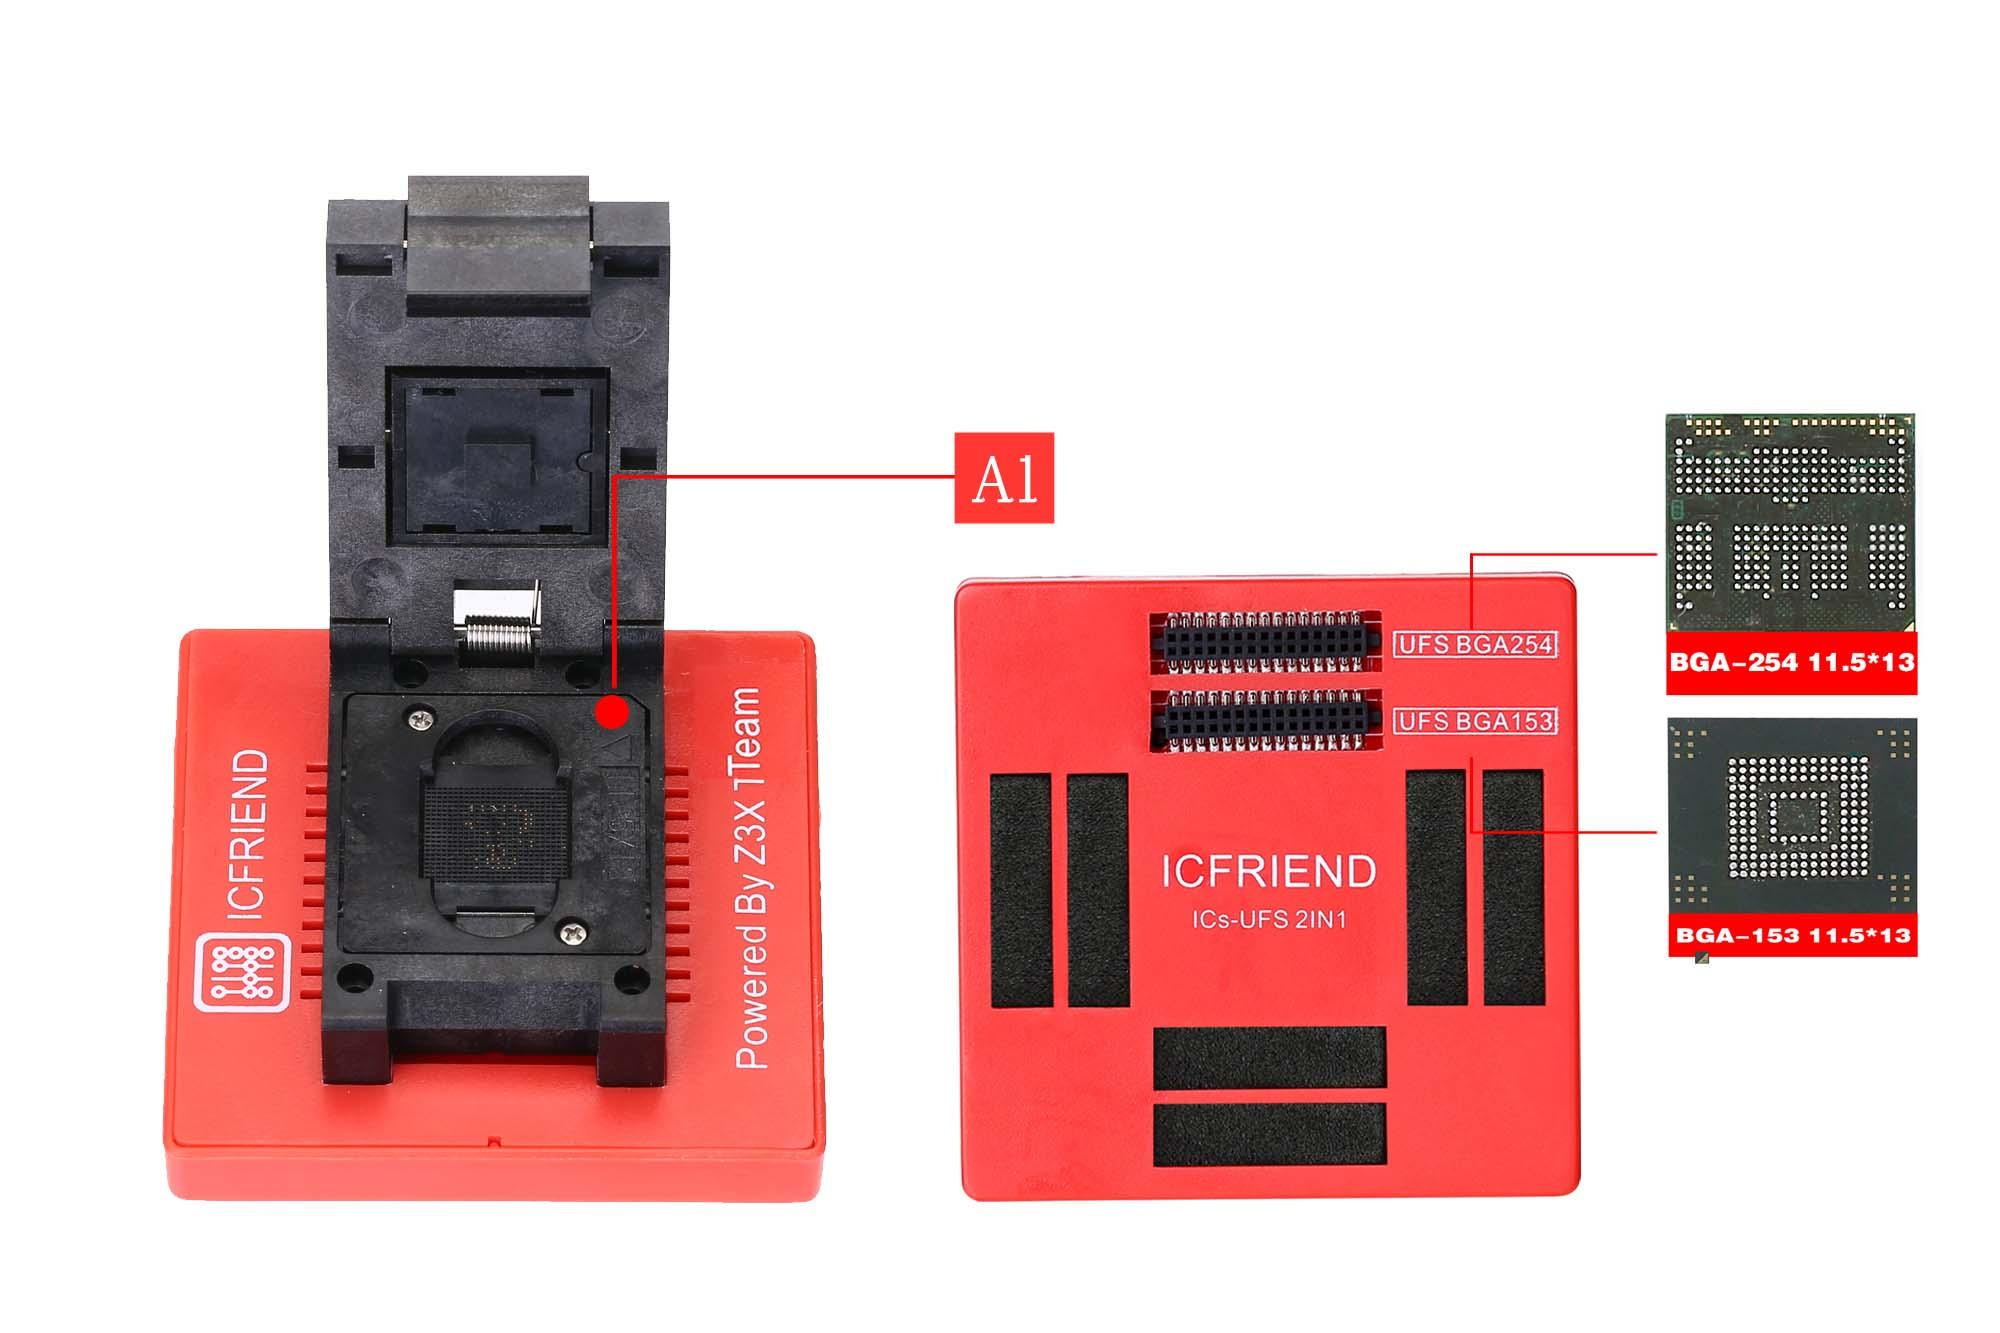 UFS adapters socket ICFriend ICs-UFS Bga 95 work for easy-jtag plus boxUFS adapters socket ICFriend ICs-UFS Bga 95 work for easy-jtag plus box